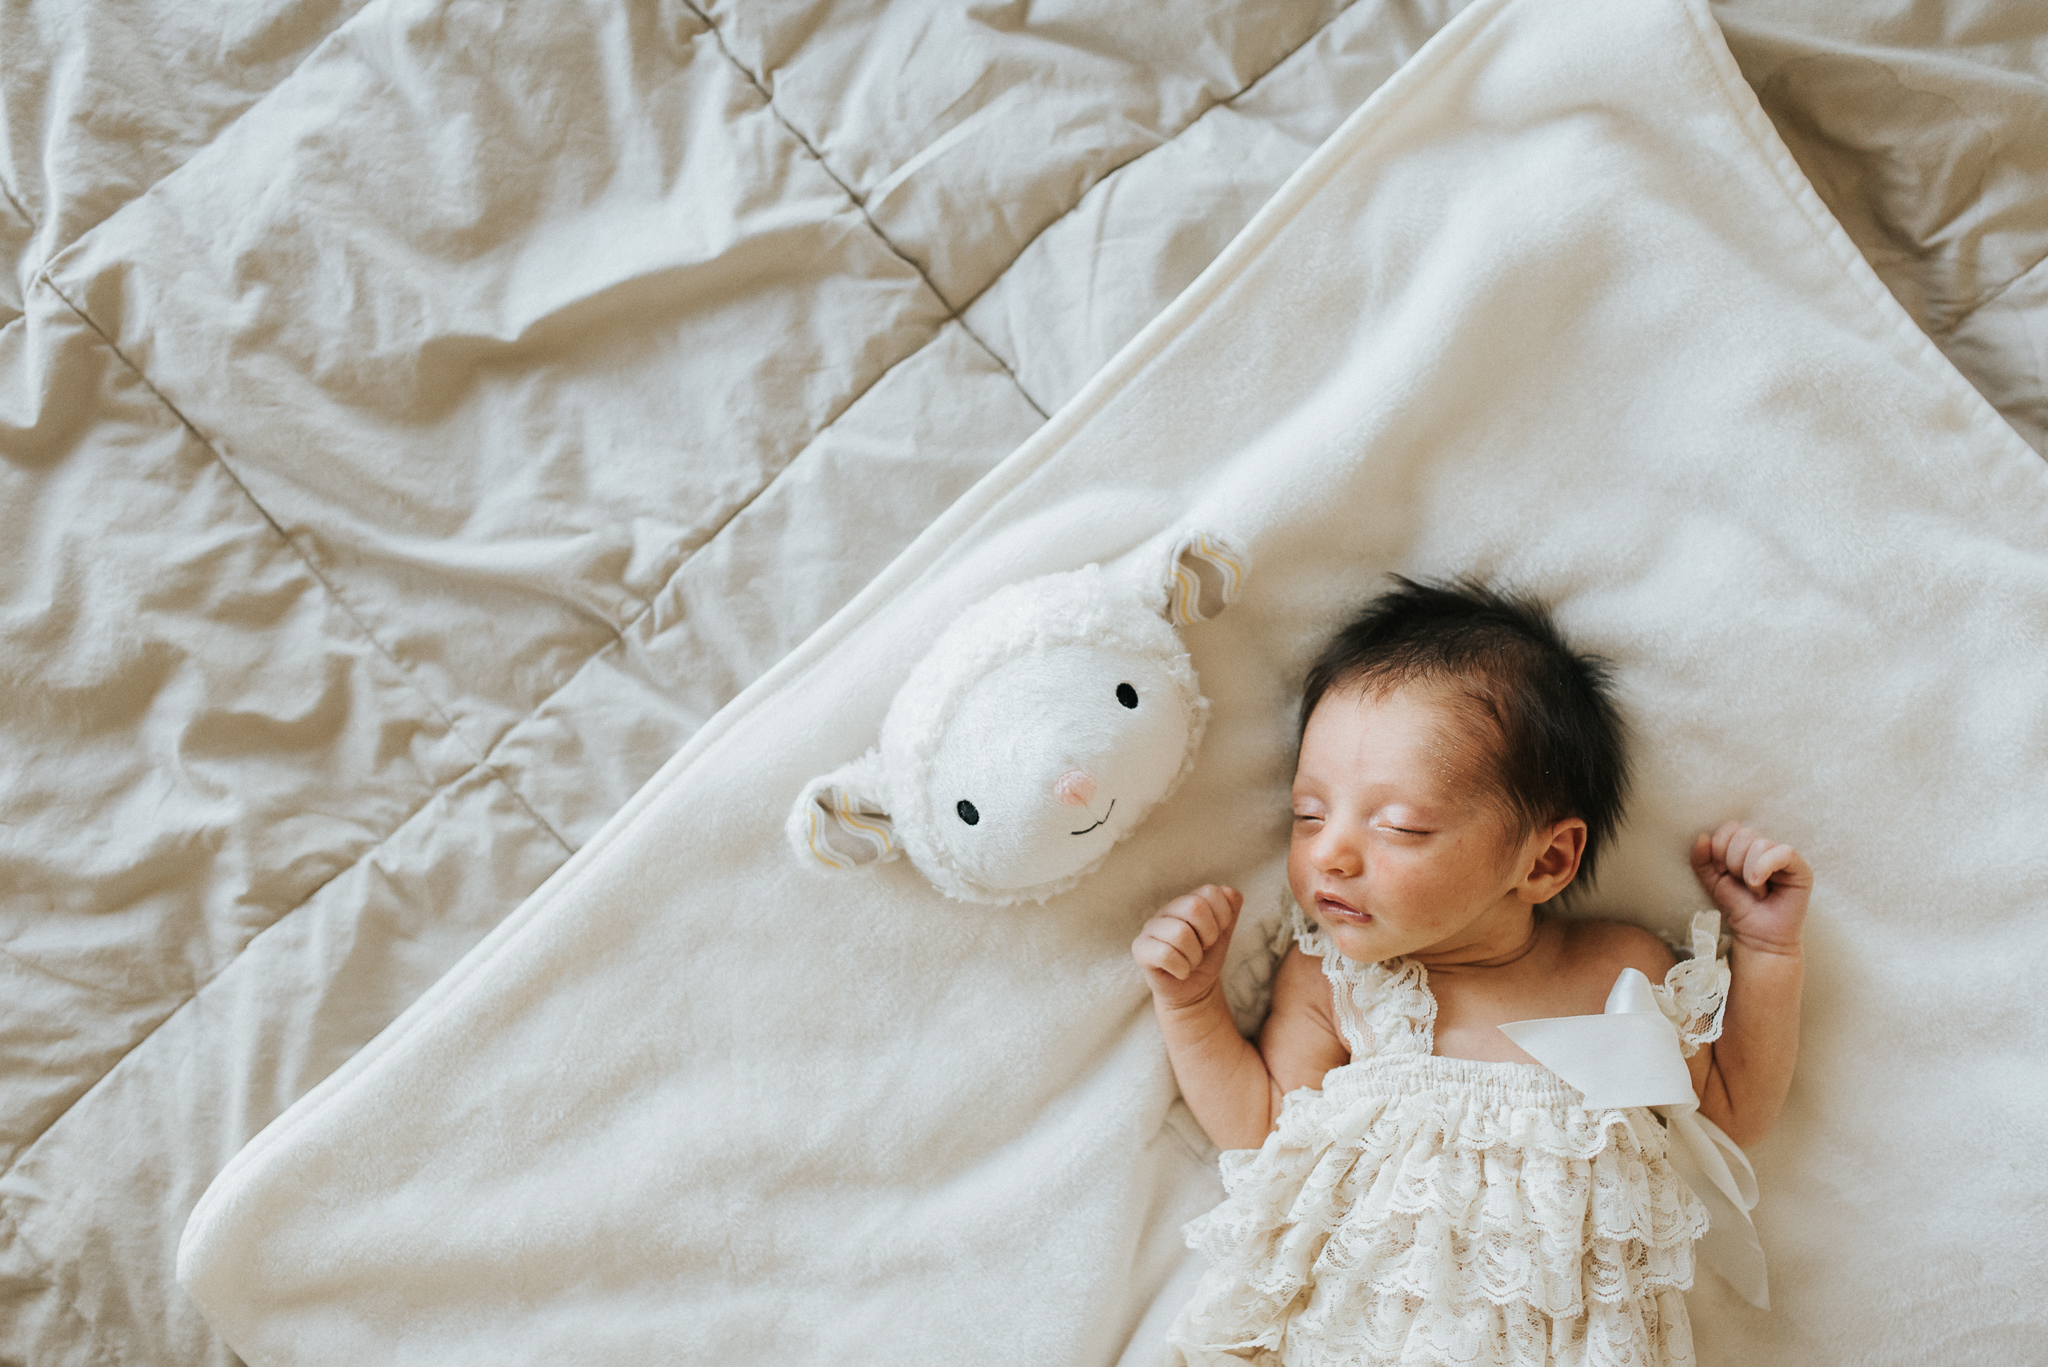 Newborn Photographer_Round Rock Newborn Photographer_Pflugerville Newborn Photographer_Austin Newborn Photographer_Newborn Photography-7.jpg